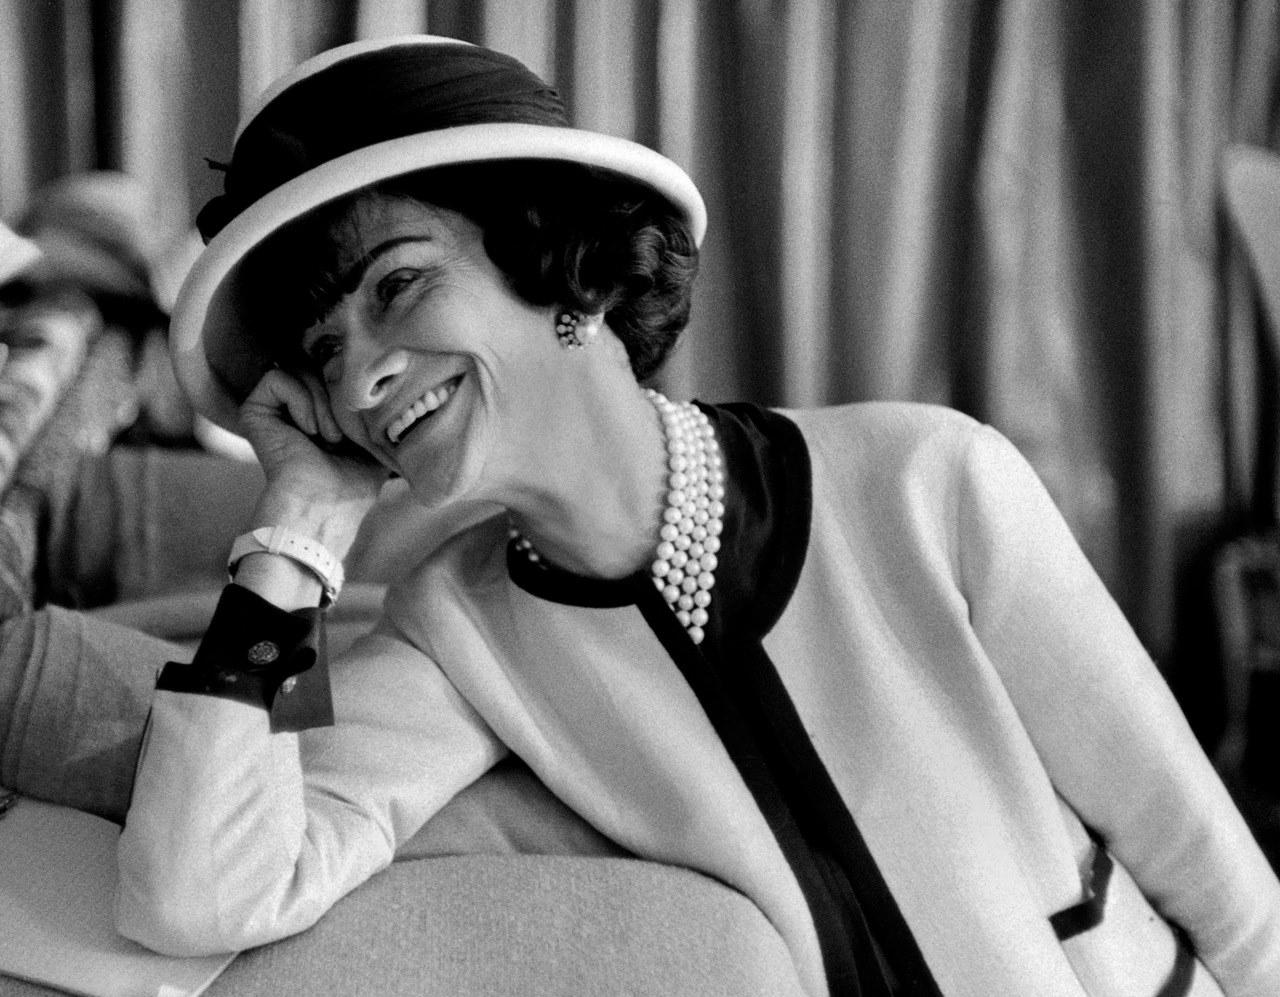 Vòng cổ ngọc trai Coco Chanel